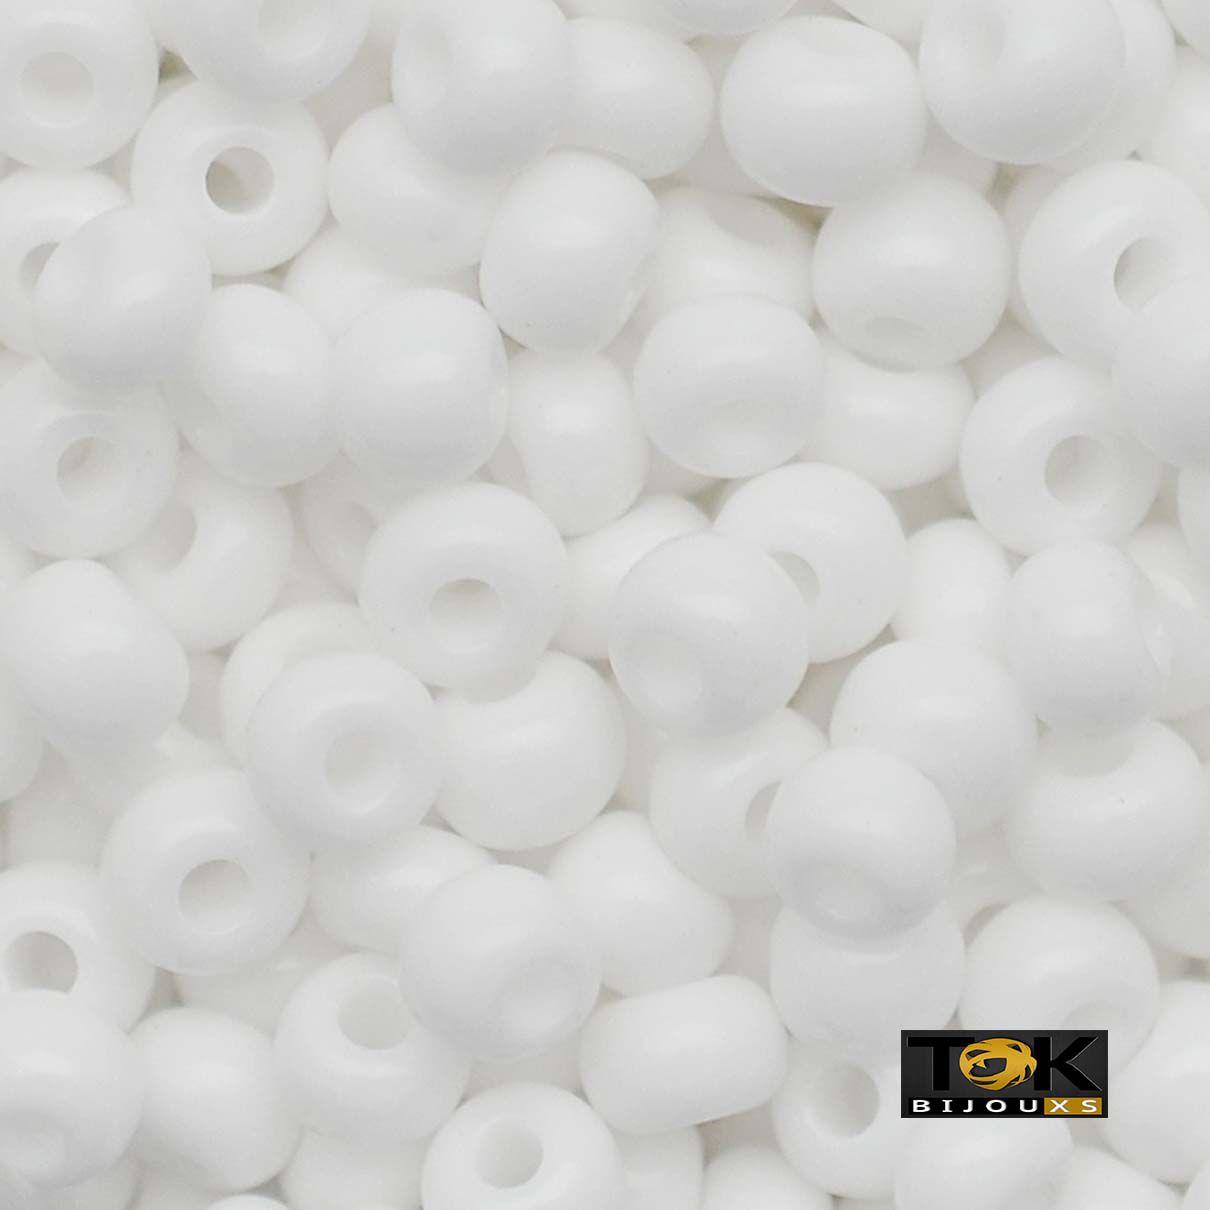 Missanguinha Jablonex - Branco Leitoso - 500g